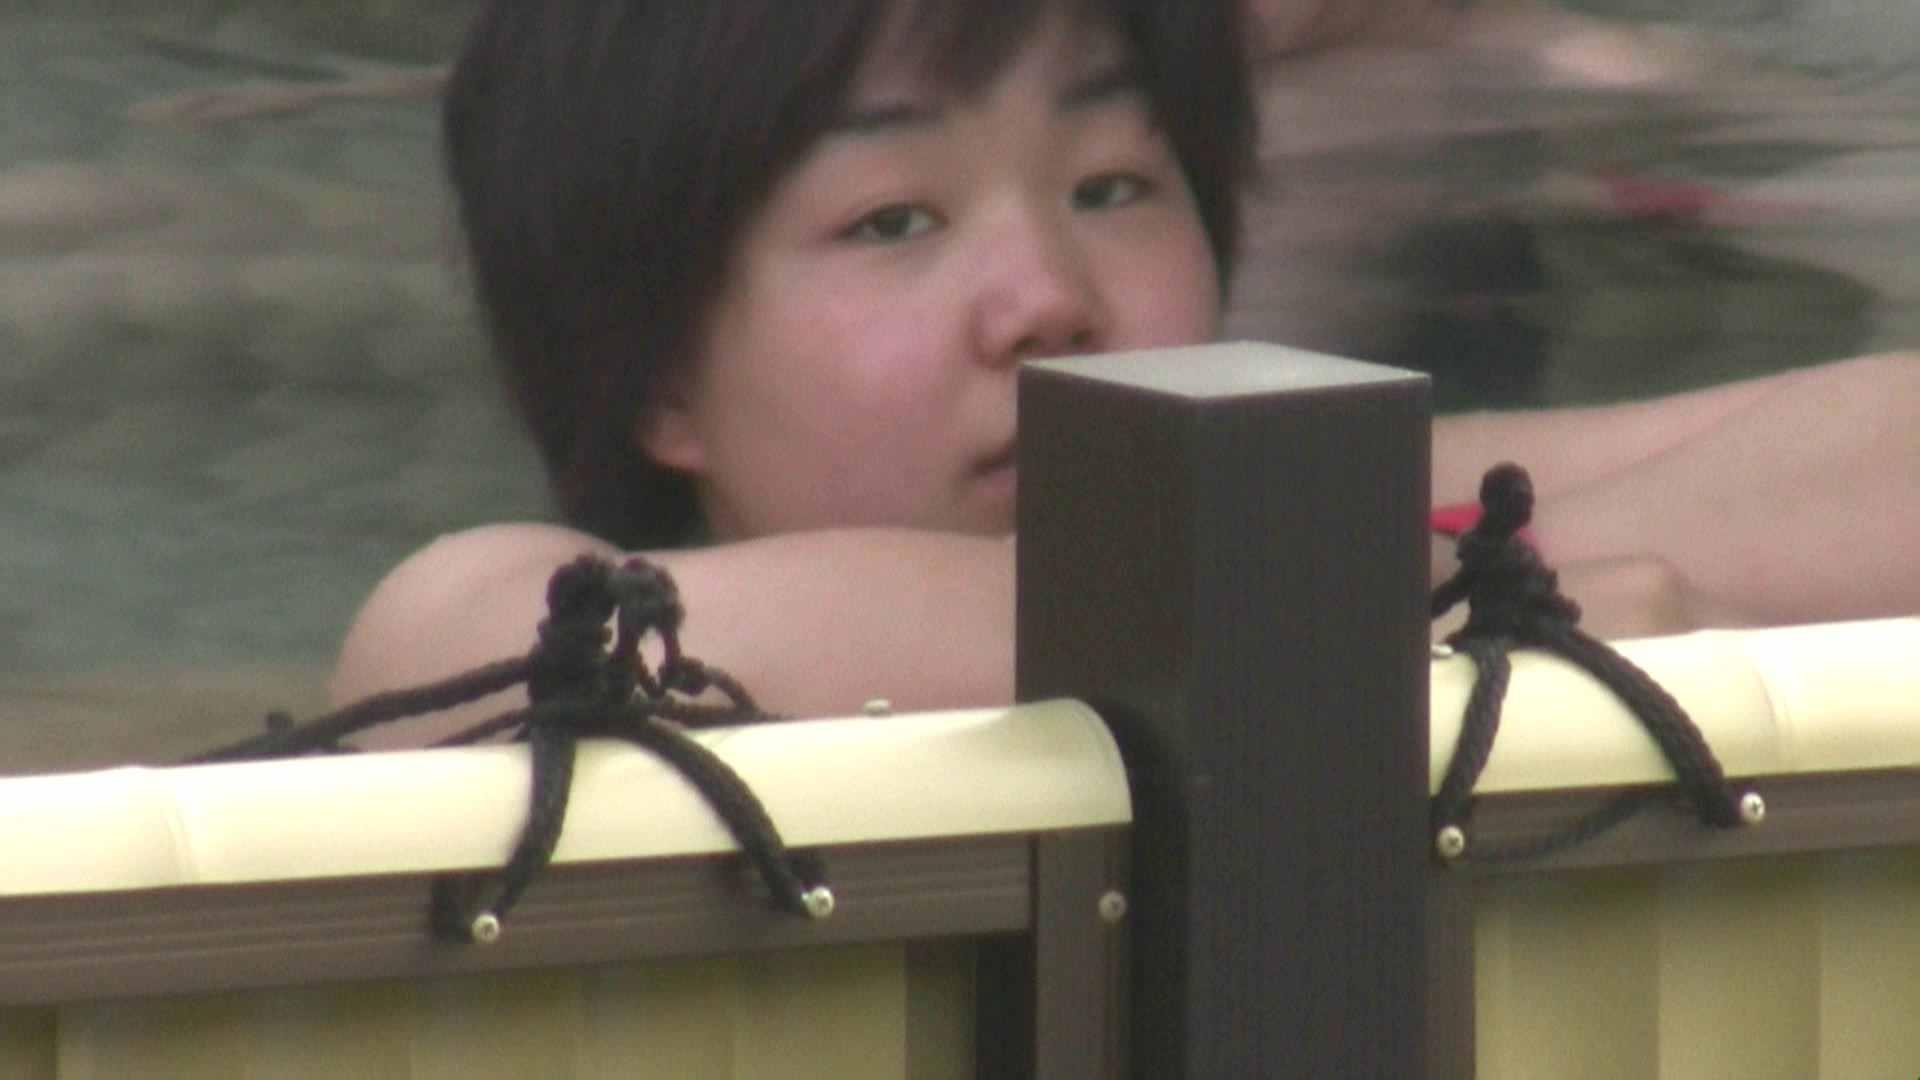 Aquaな露天風呂Vol.53【VIP限定】 女体盗撮 | OL女体  93連発 28